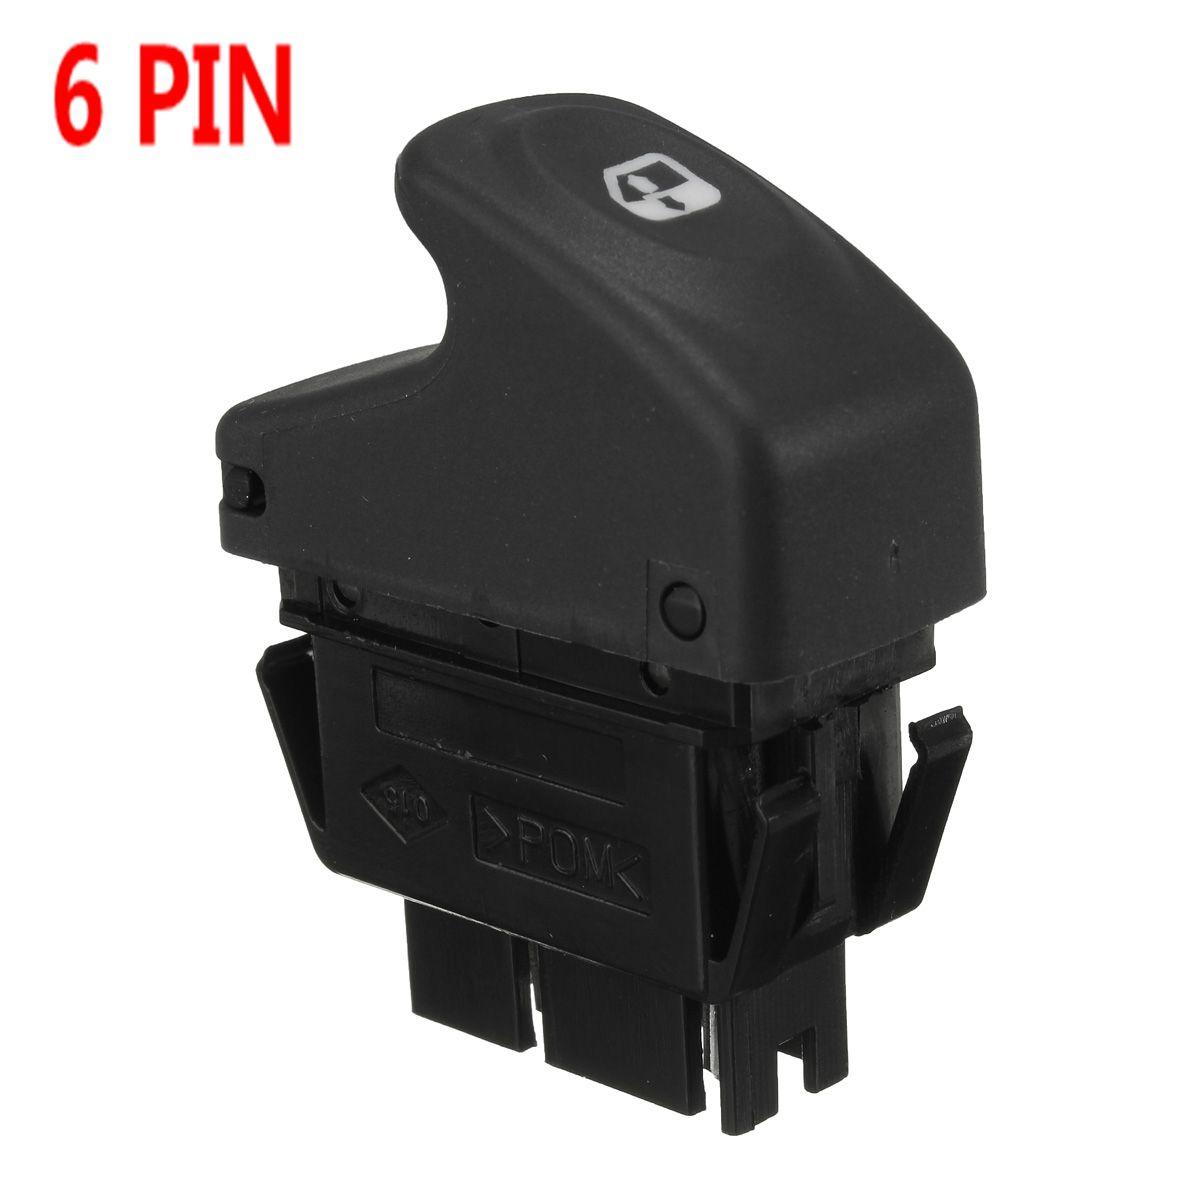 6 Pin Auto Elektrische Fenster Control Schalter für Renault Clio II Megane ICH BA0 BA1 EA0 EA1 DA0 Kangoo KC0 KC1 FC0 FC1